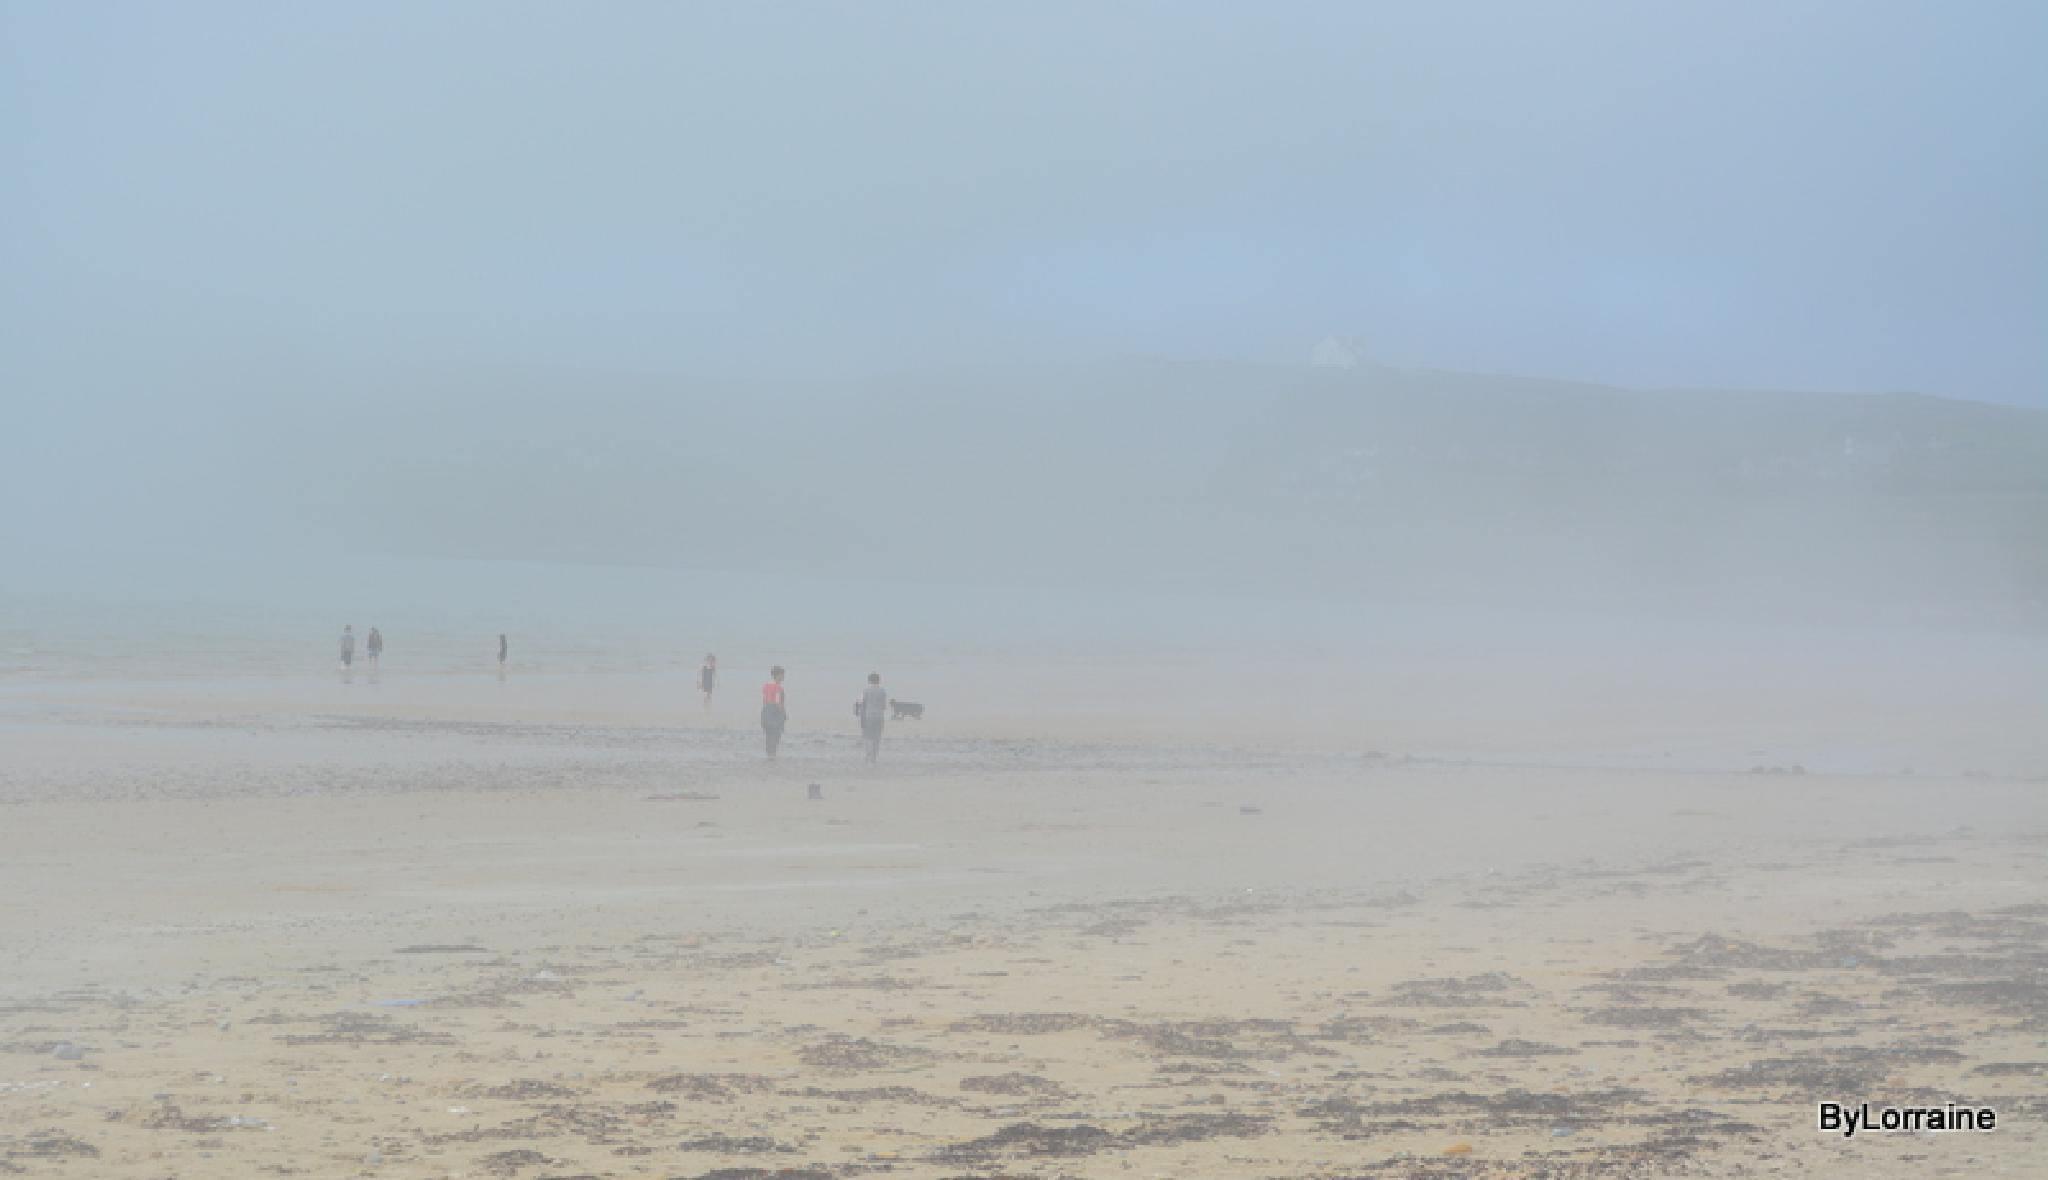 Lowry Style Beach Shot by Lorraine. Sgt